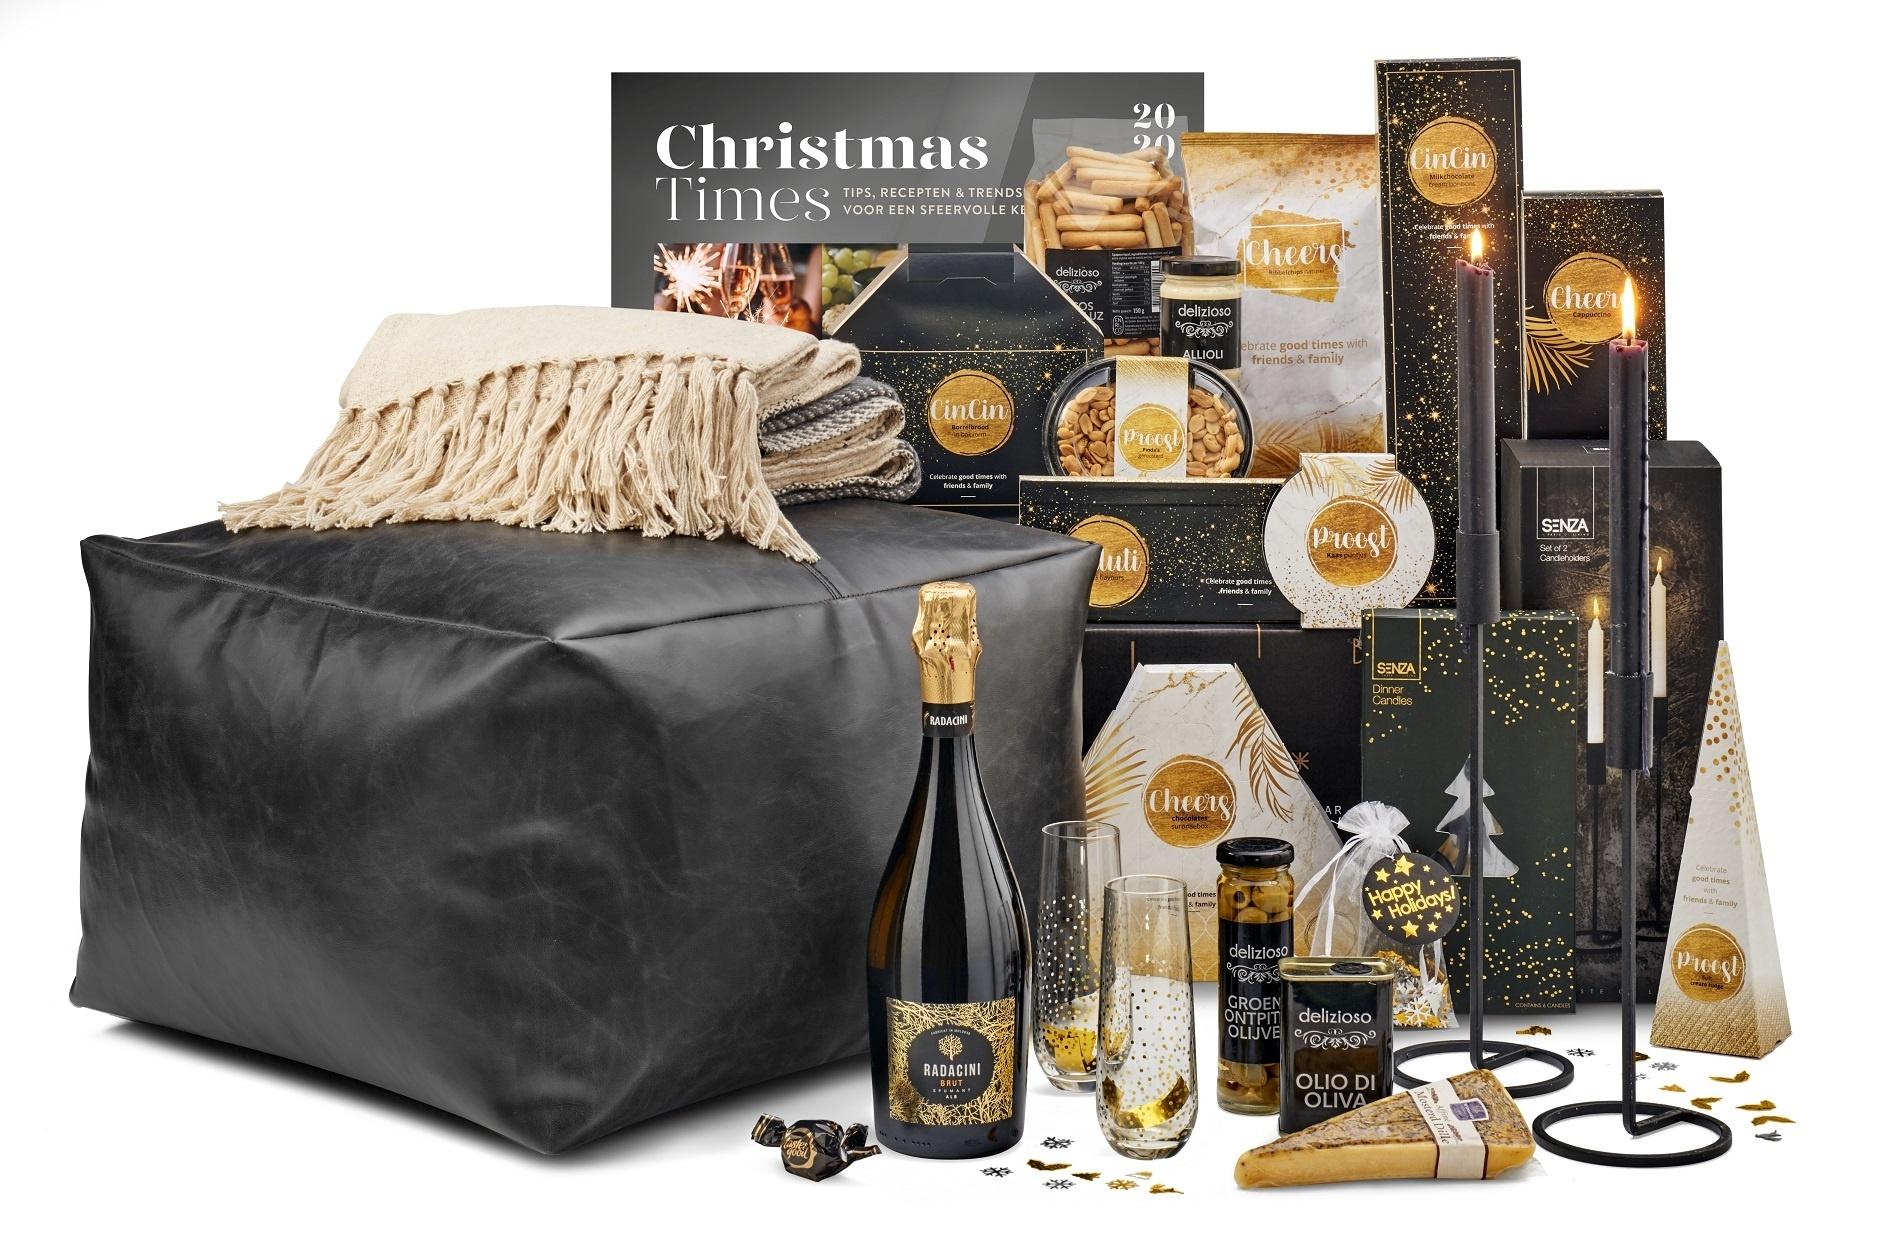 Kerstpakket Home sweet home - 9% BTW